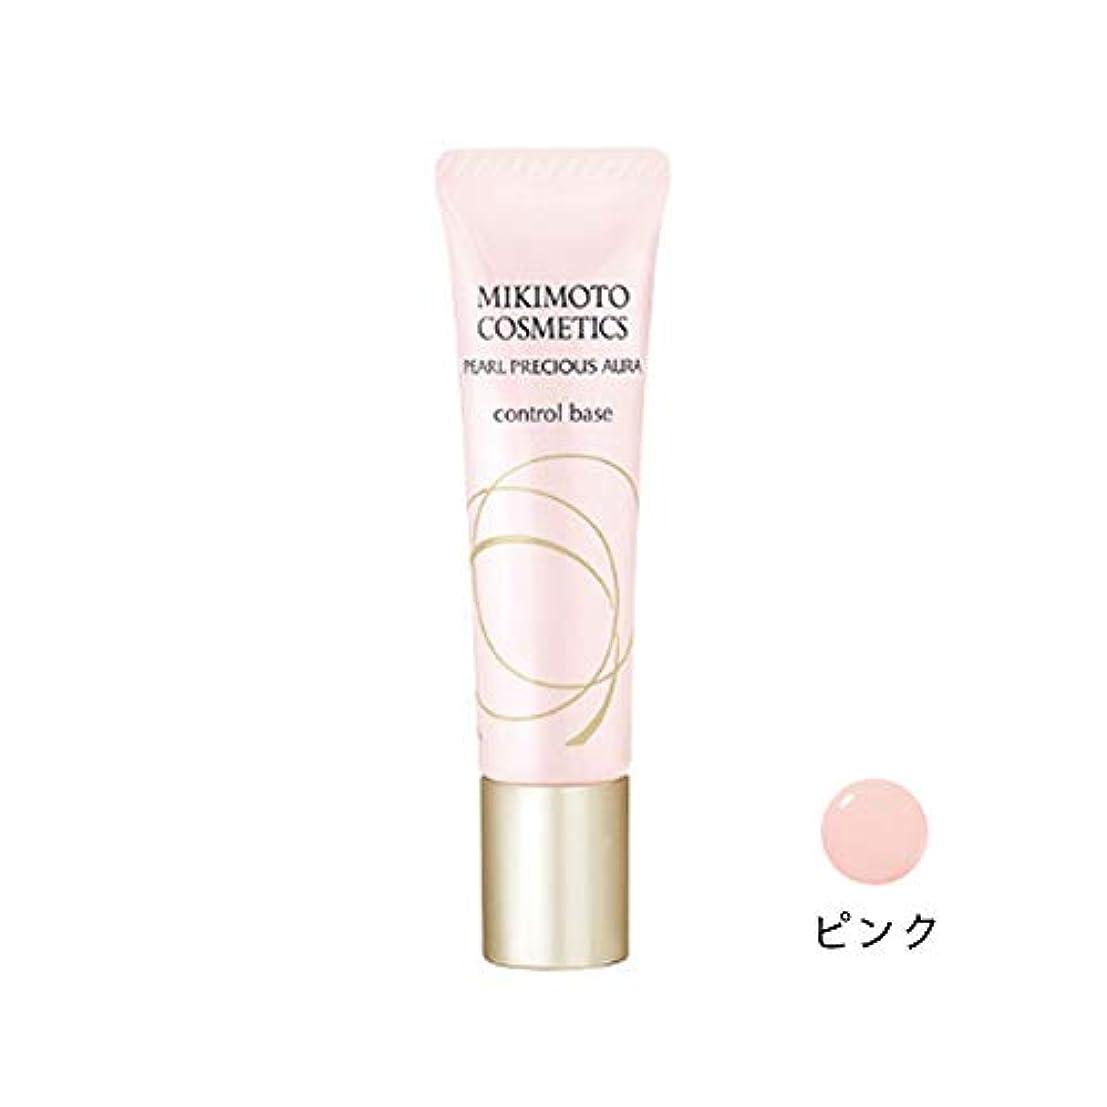 MIKIMOTO ミキモト コスメティックス コントロールベースA 【ピンク】 化粧下地 SPF15?PA++ 15g